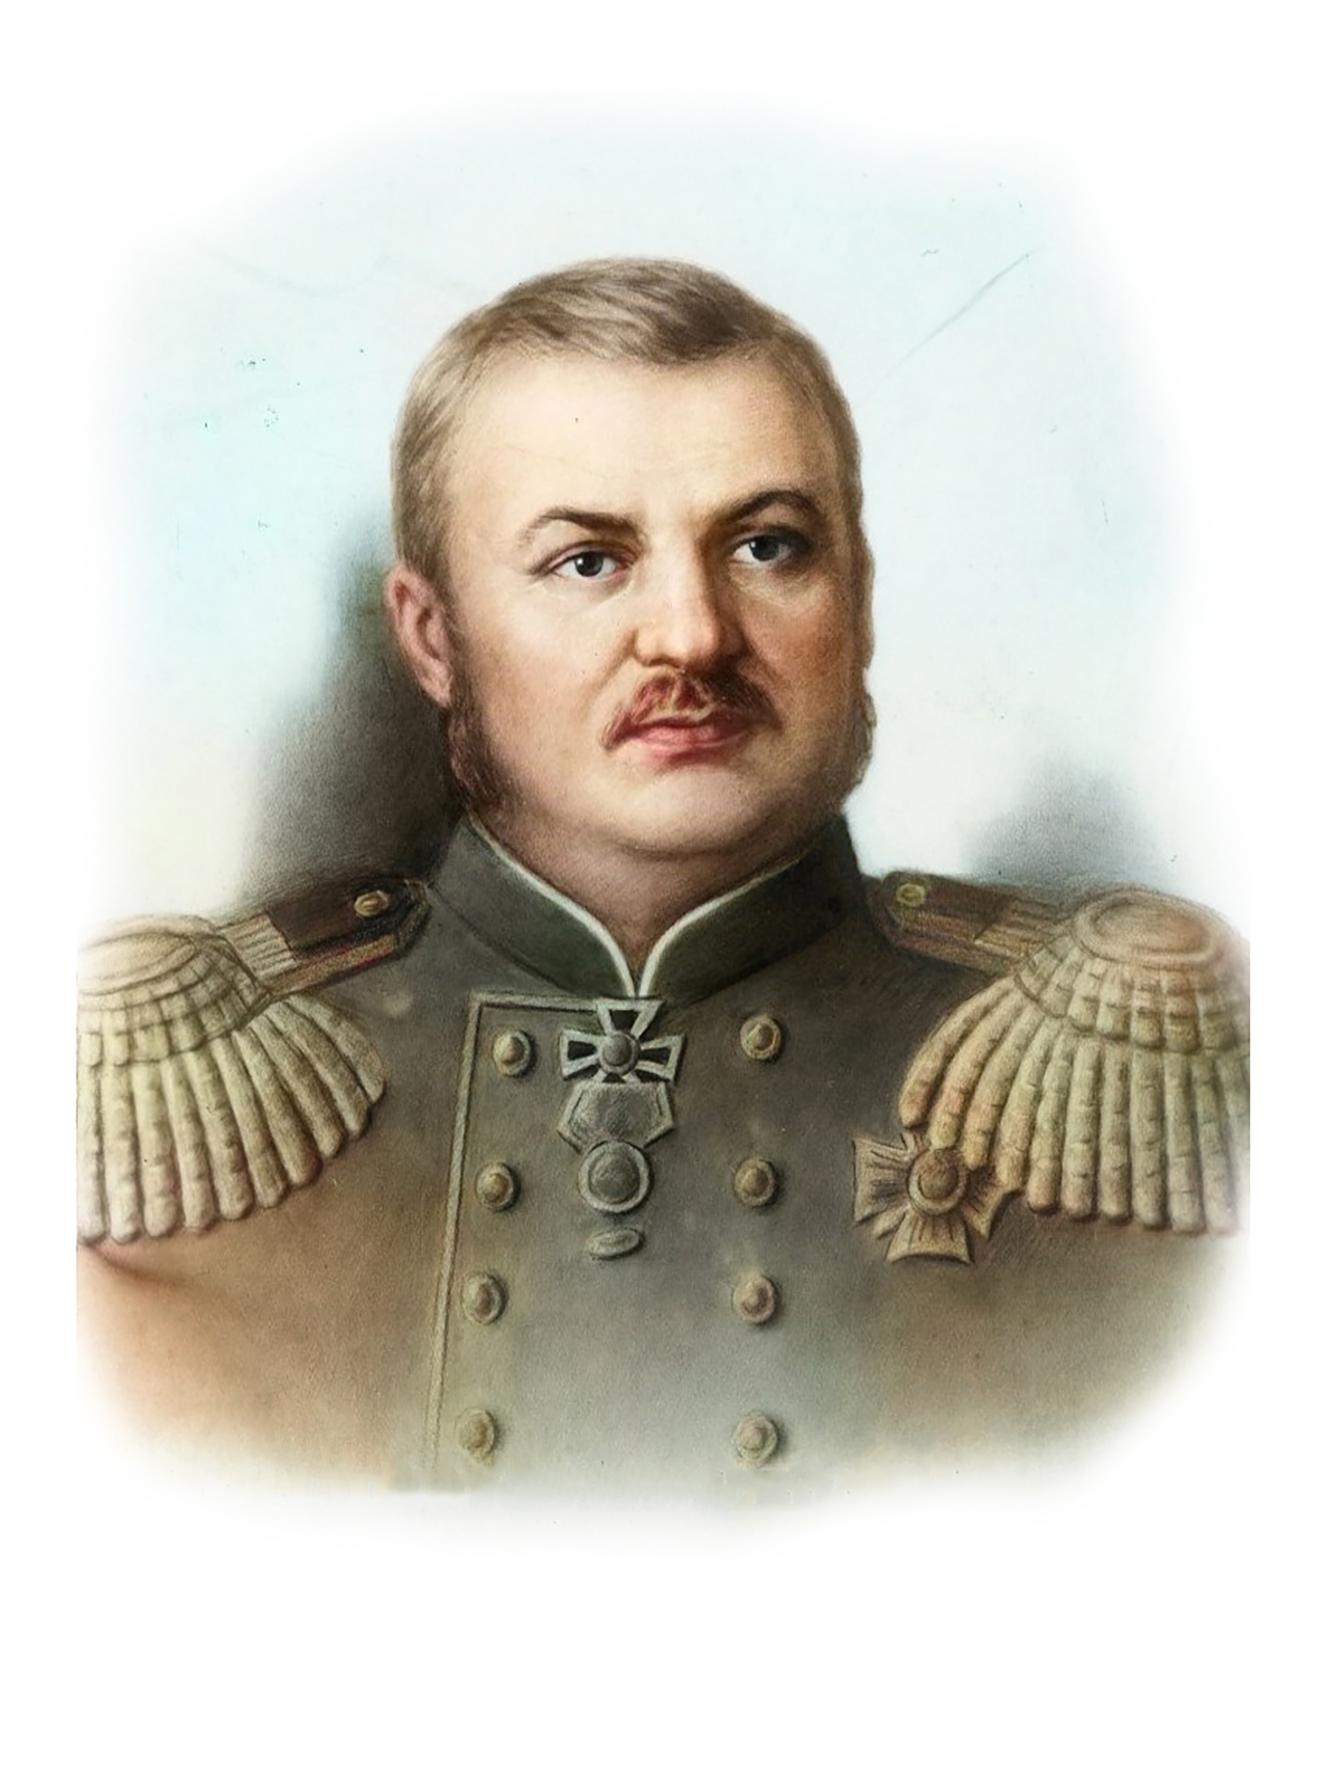 https://upload.wikimedia.org/wikipedia/commons/7/7b/Konstantin_Konstantinov.jpg